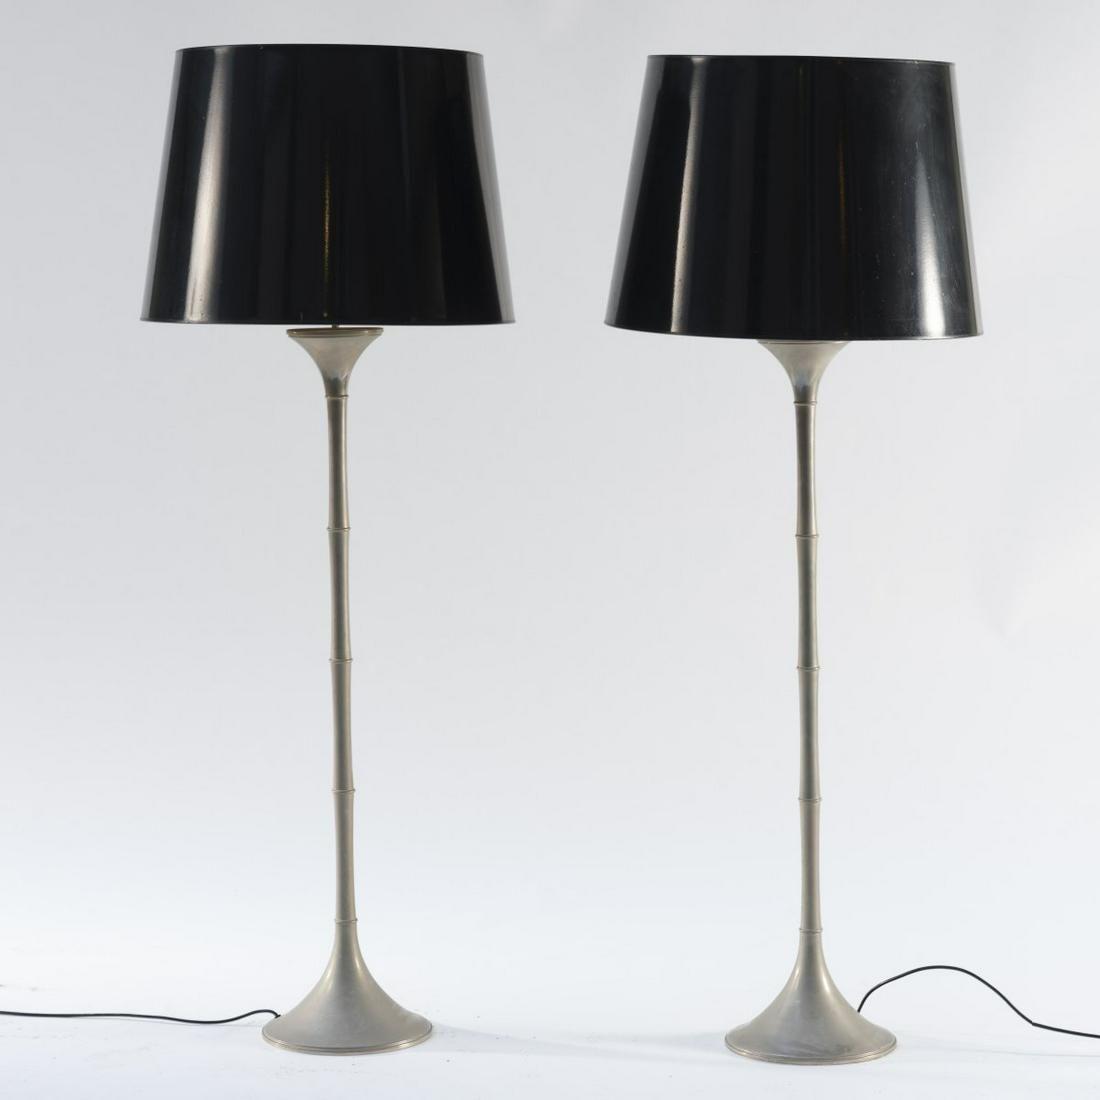 Ingo Maurer, Two 'ML 2F' floor lamps, 1970